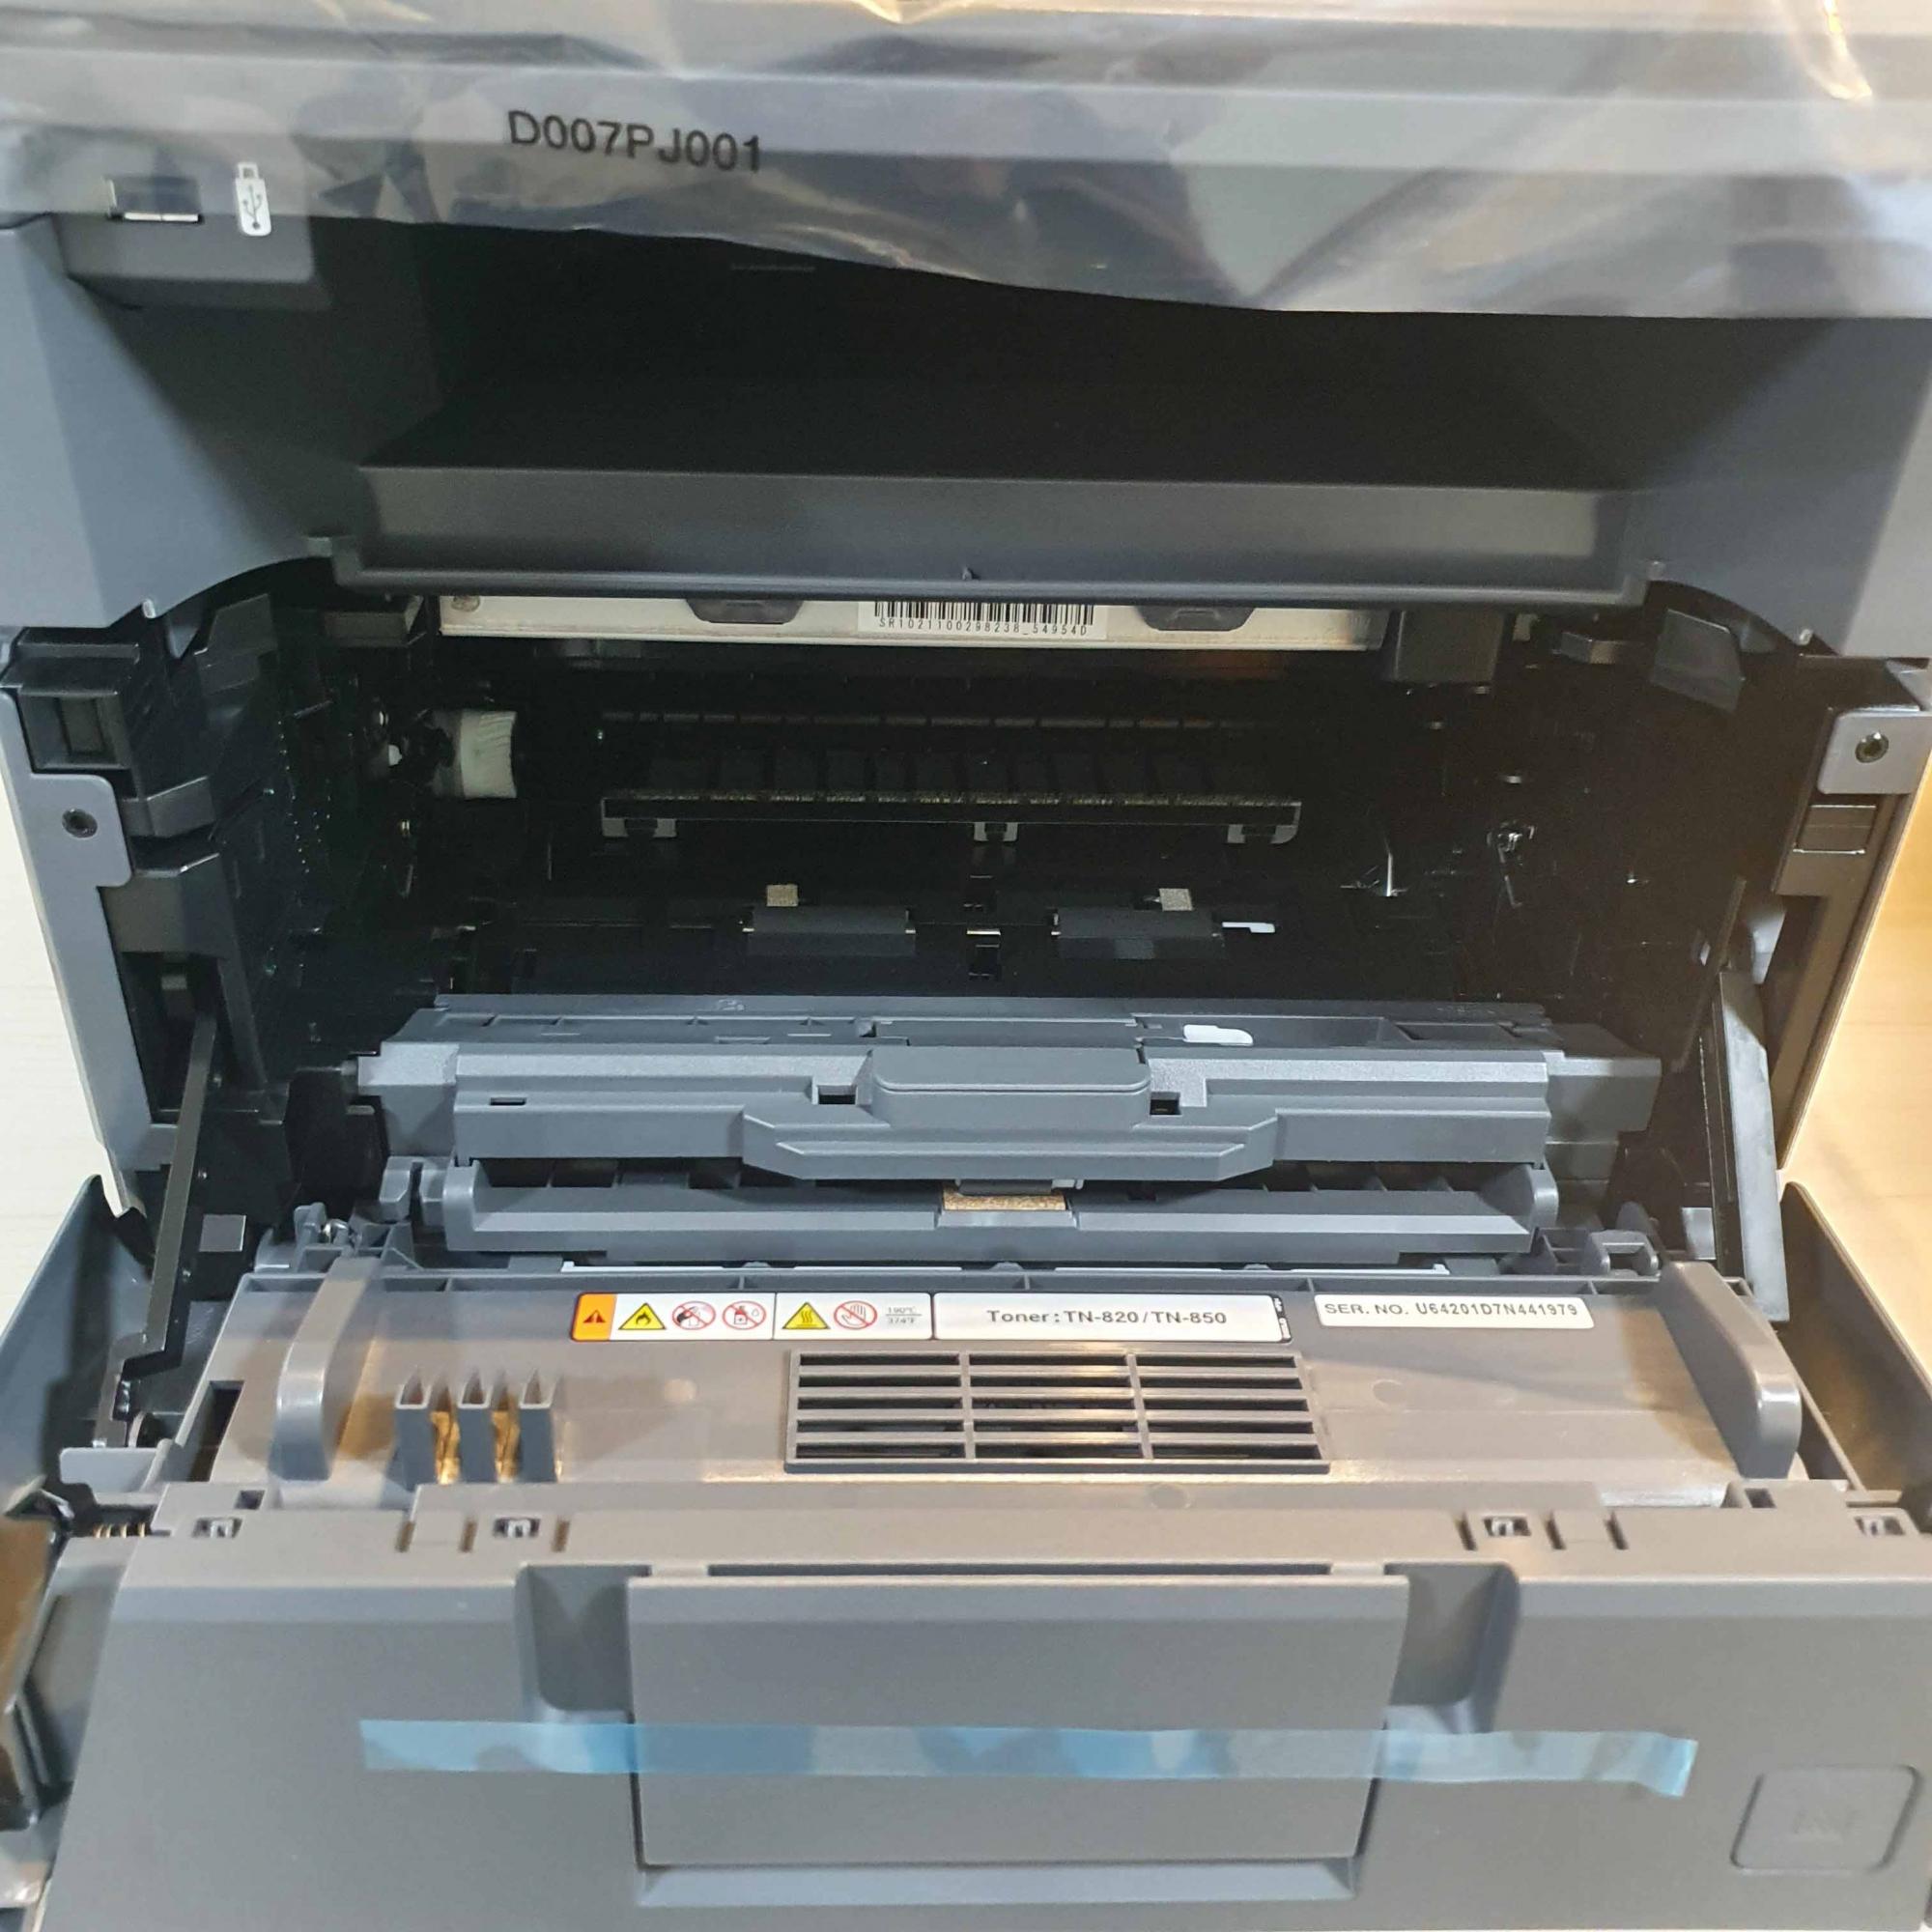 Multifuncional Brother MFC-l5800 DW   - Overprint